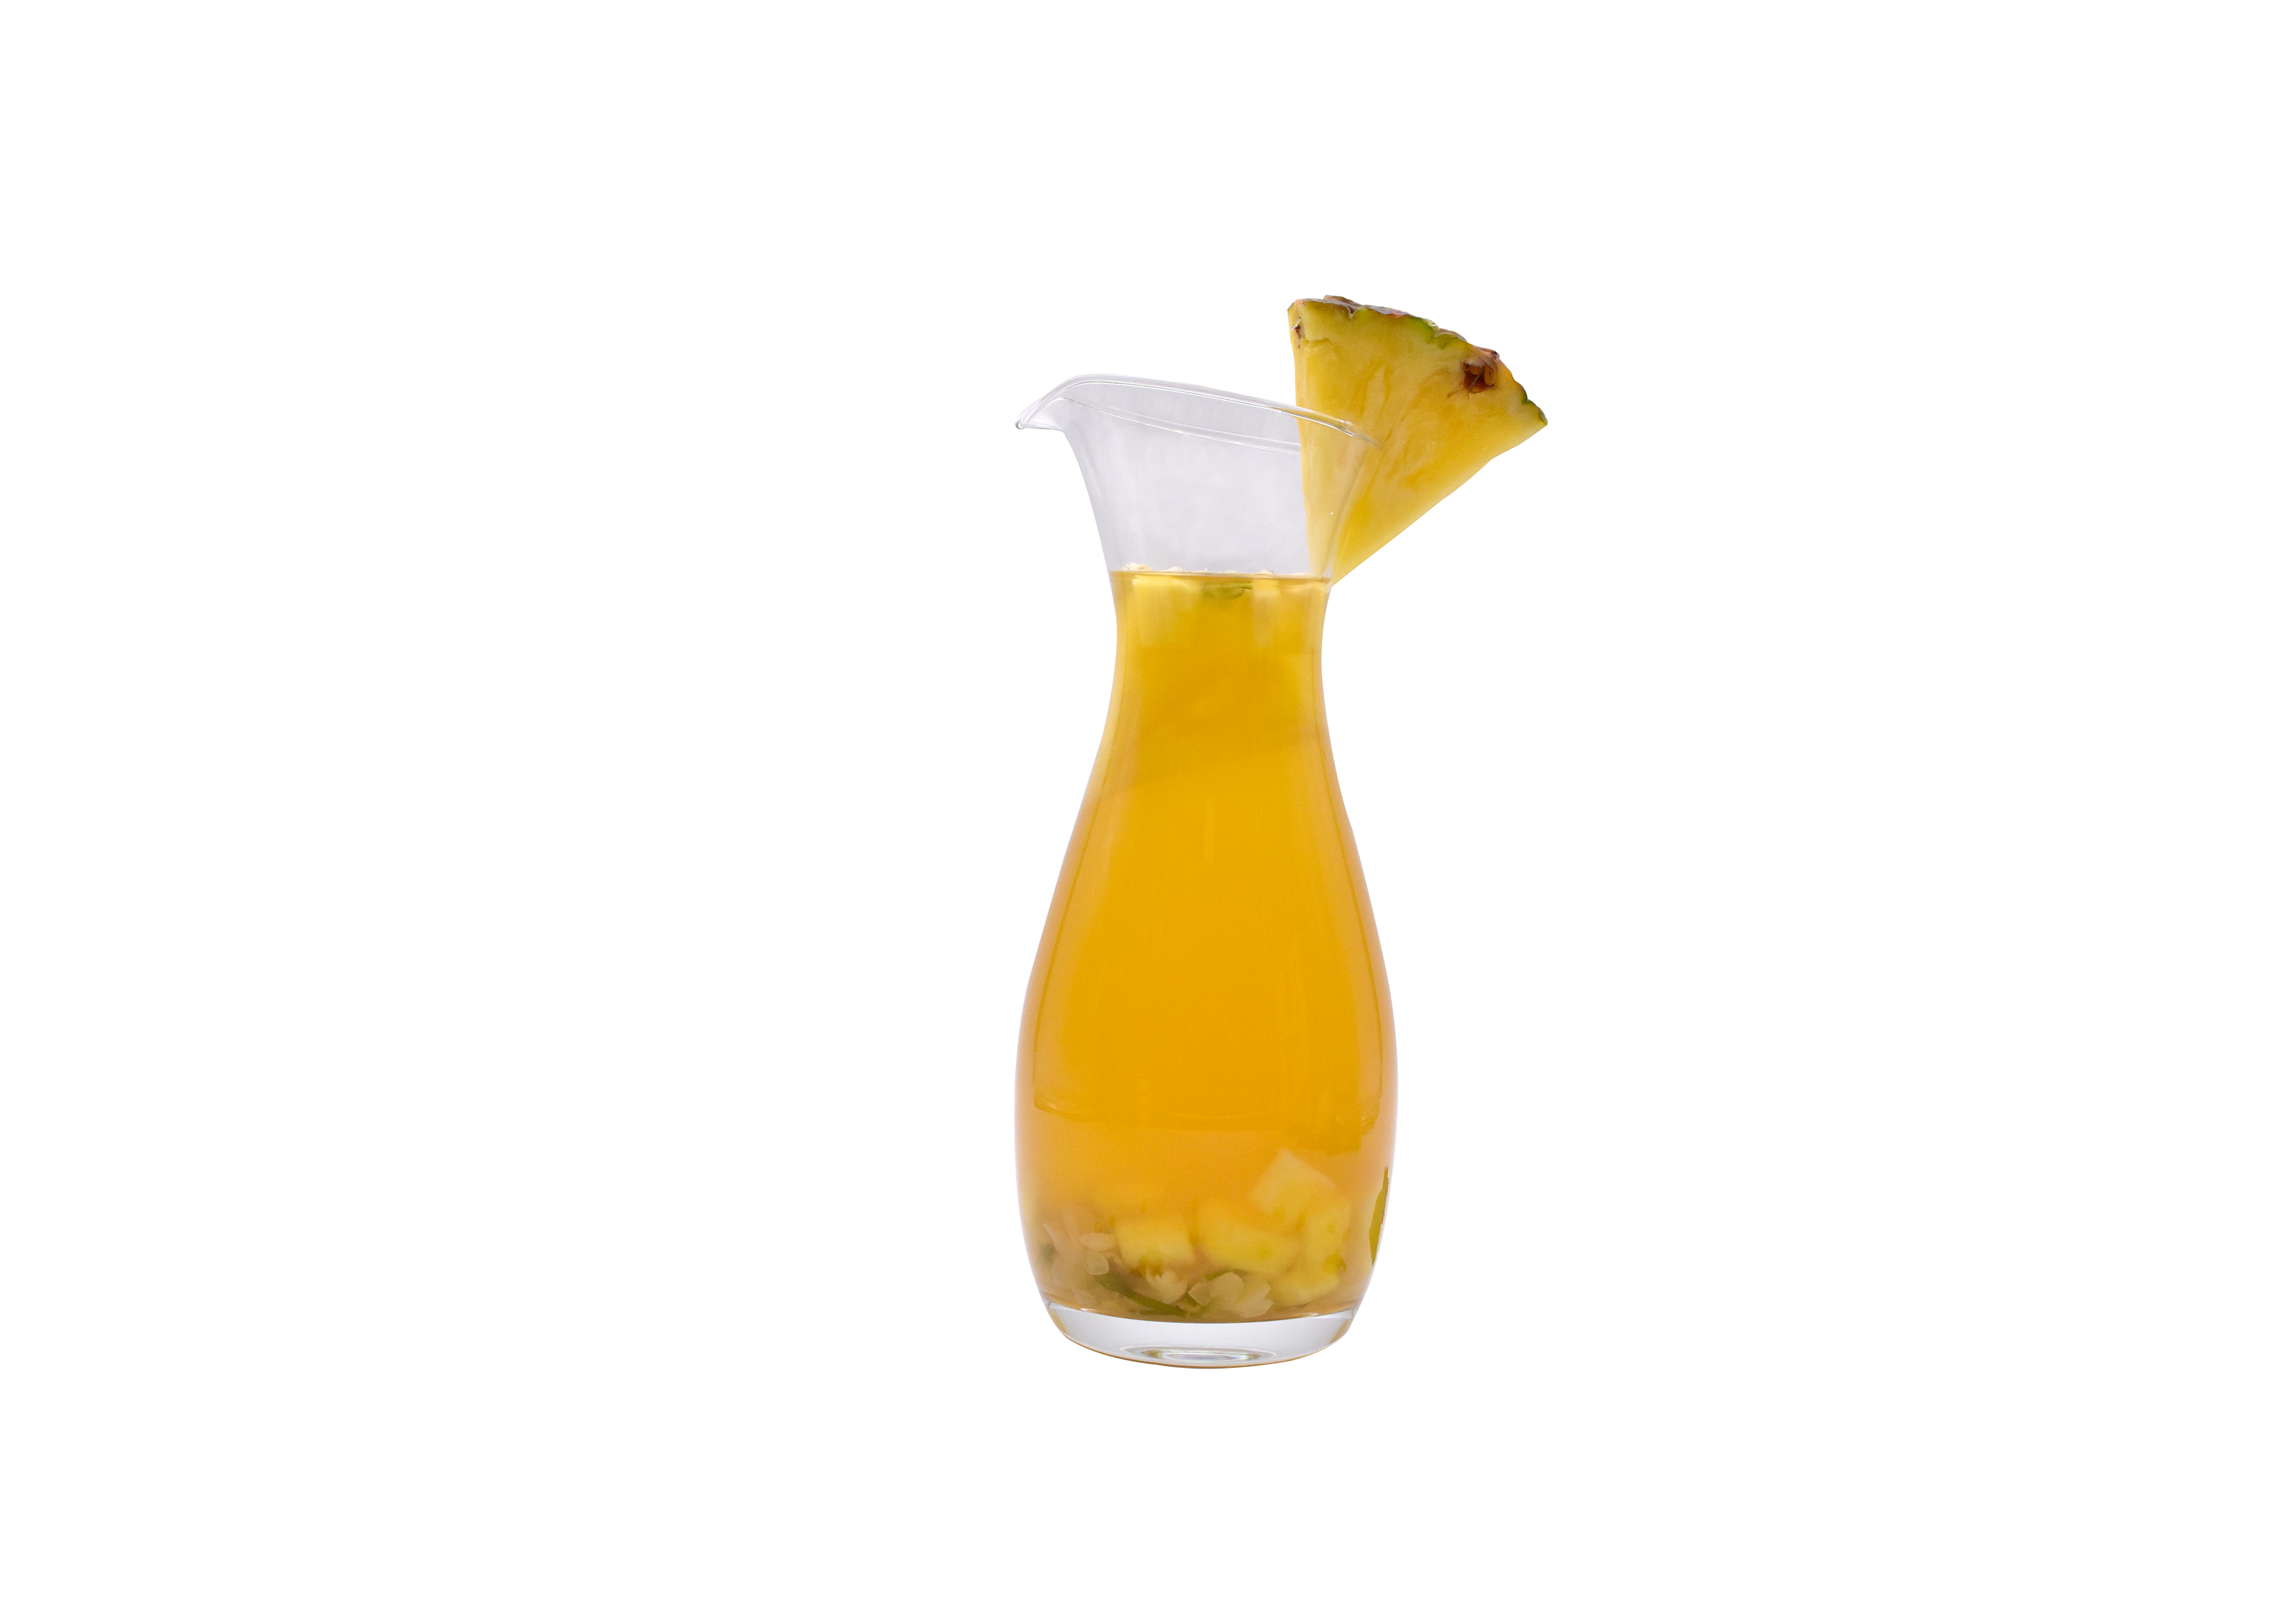 凤梨茉莉(Pineapple Jasmine)